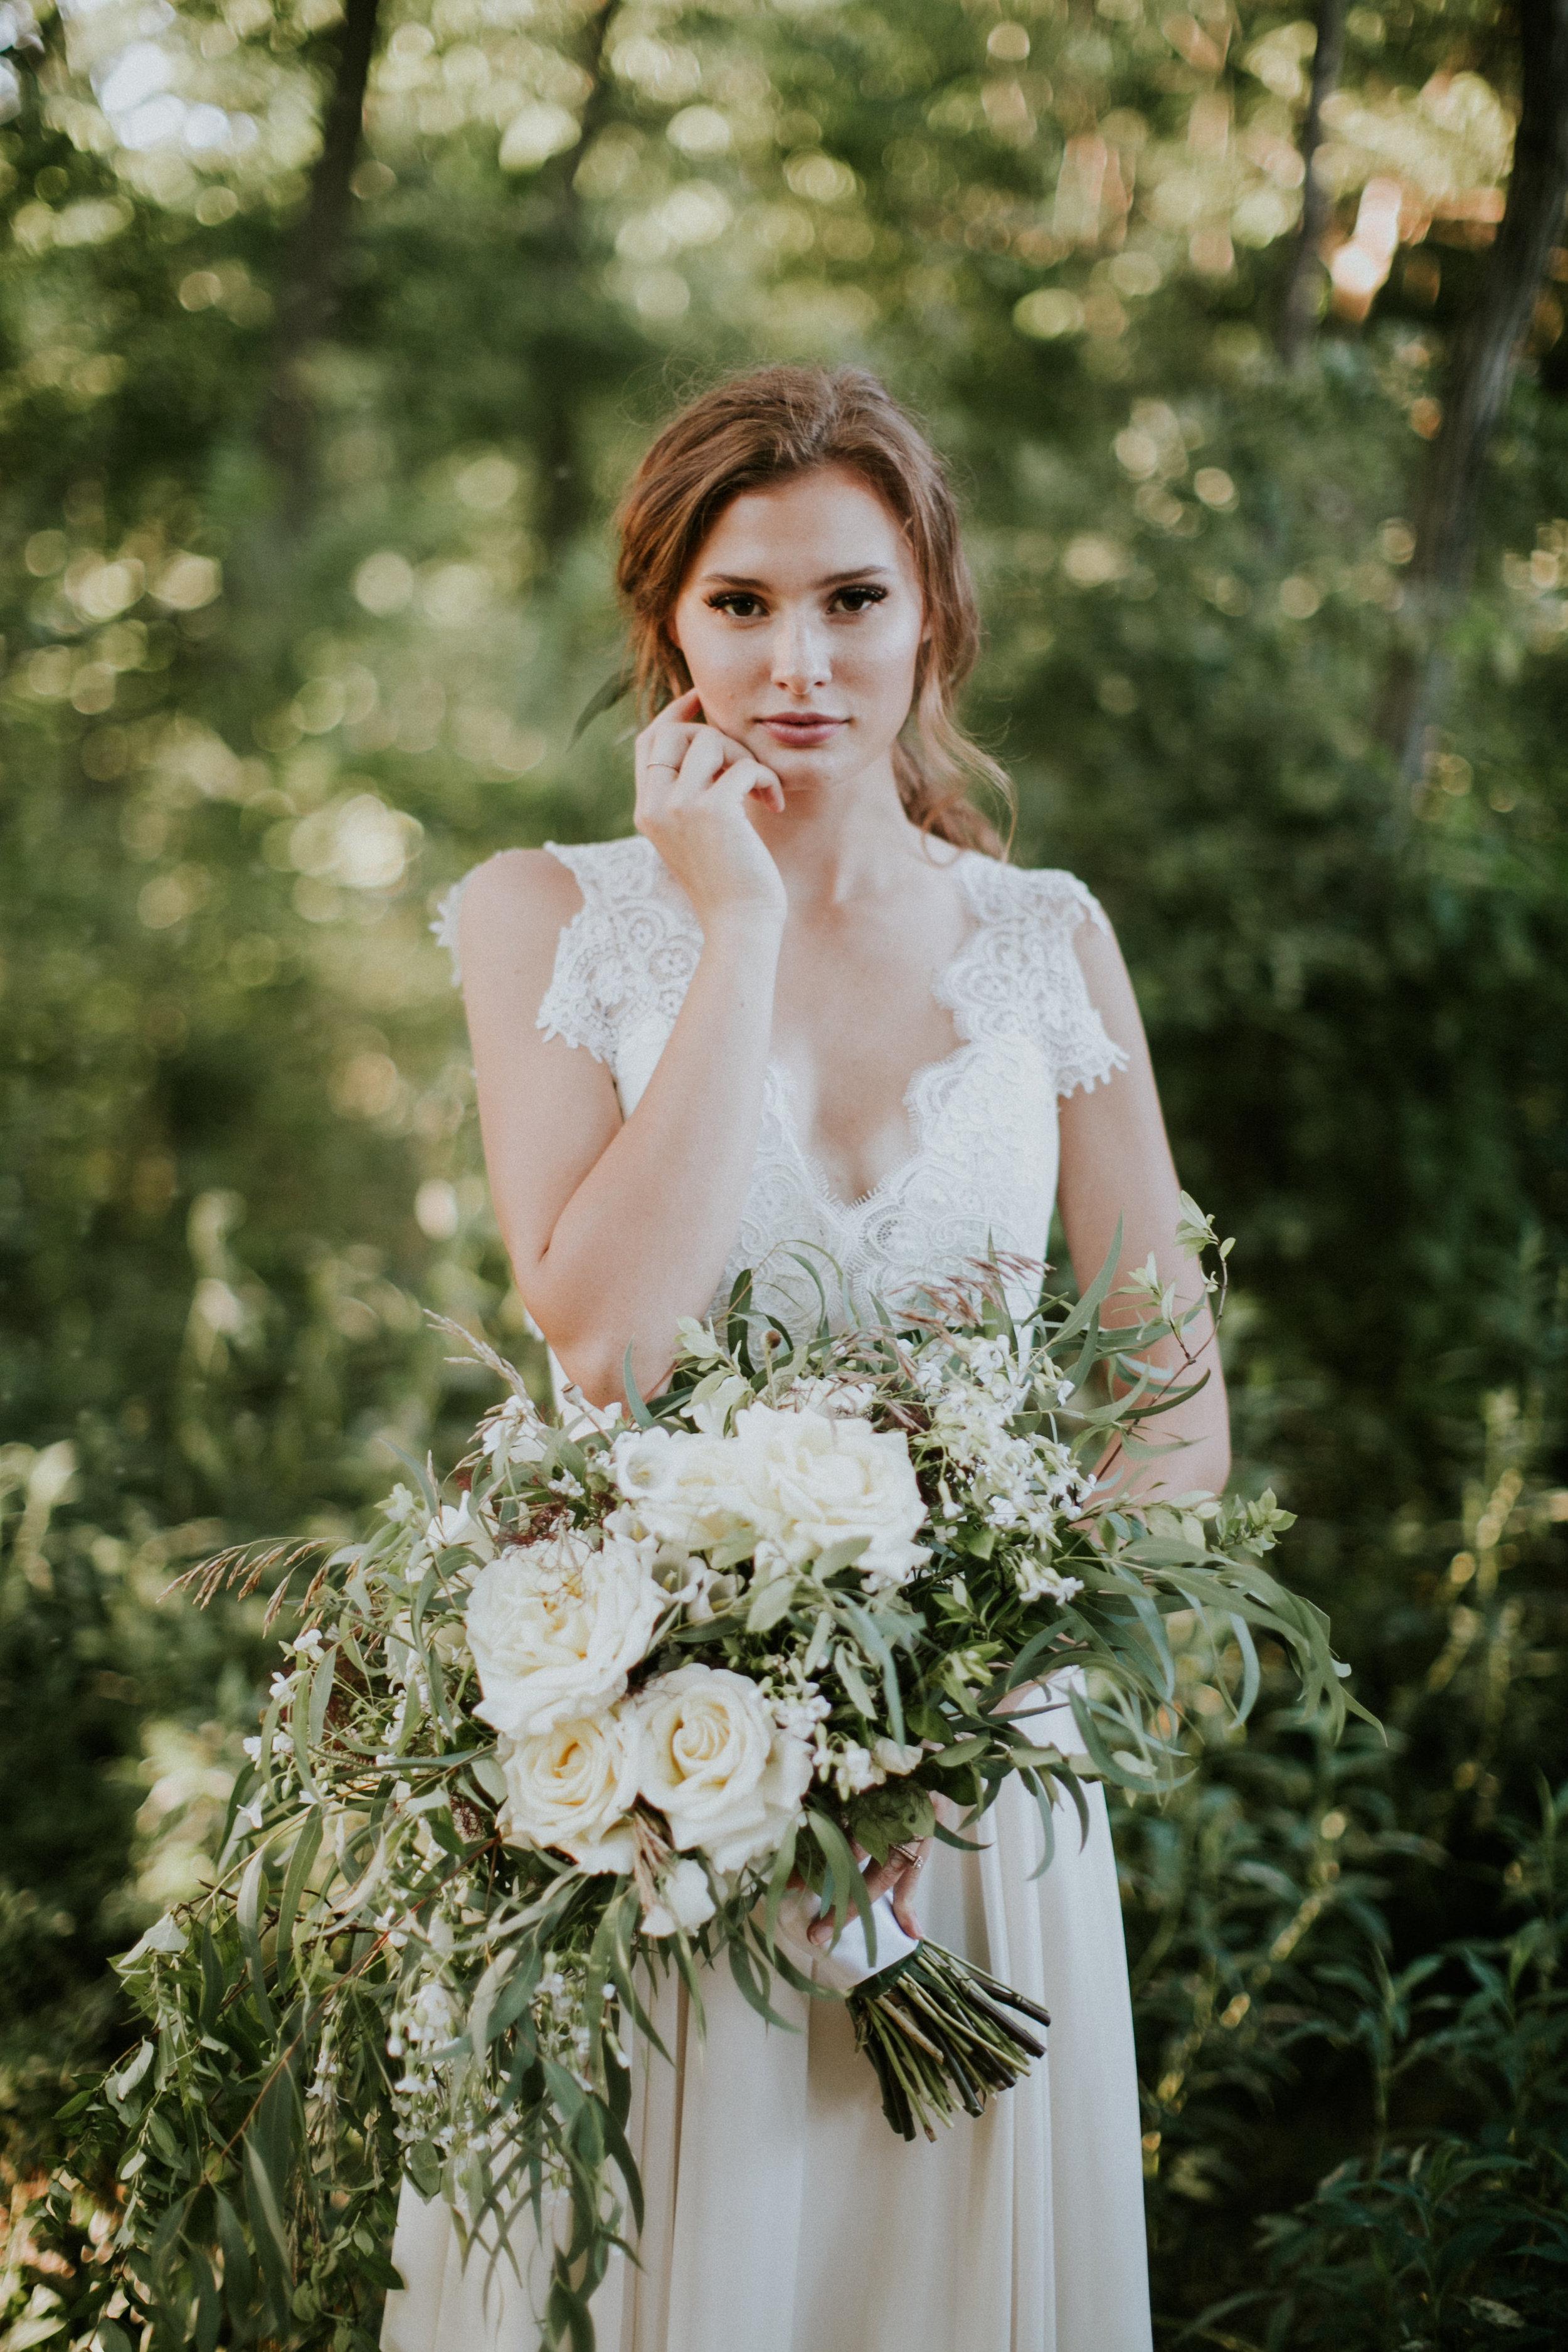 Ethereal Bridal Inspiration-Ethereal Bridal Inspiration-0099.jpg